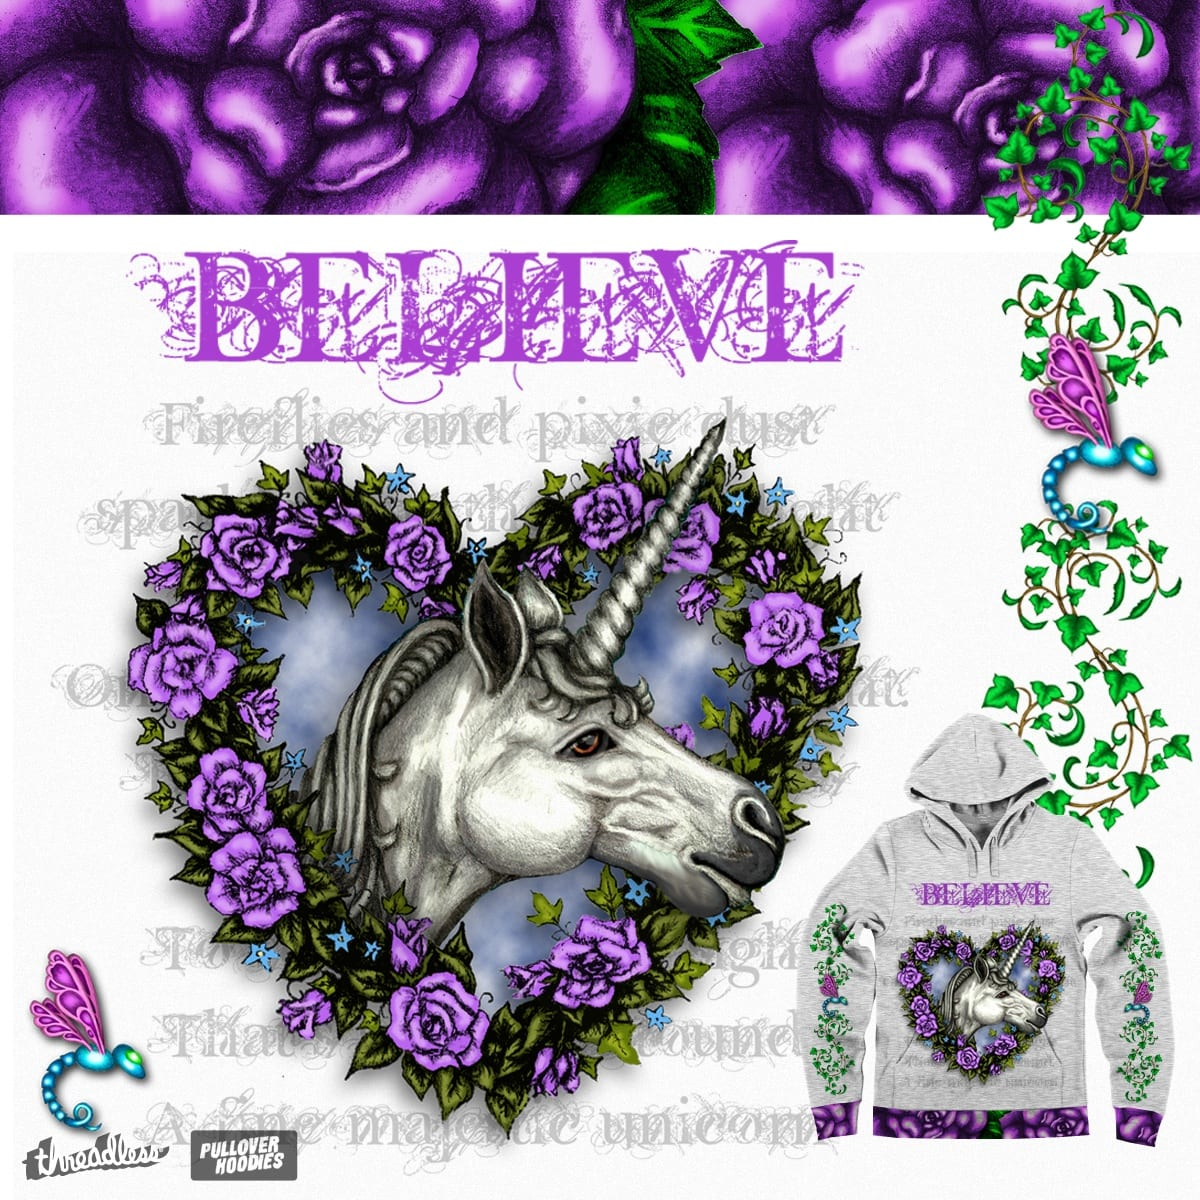 The White Unicorn by tasillustration on Threadless